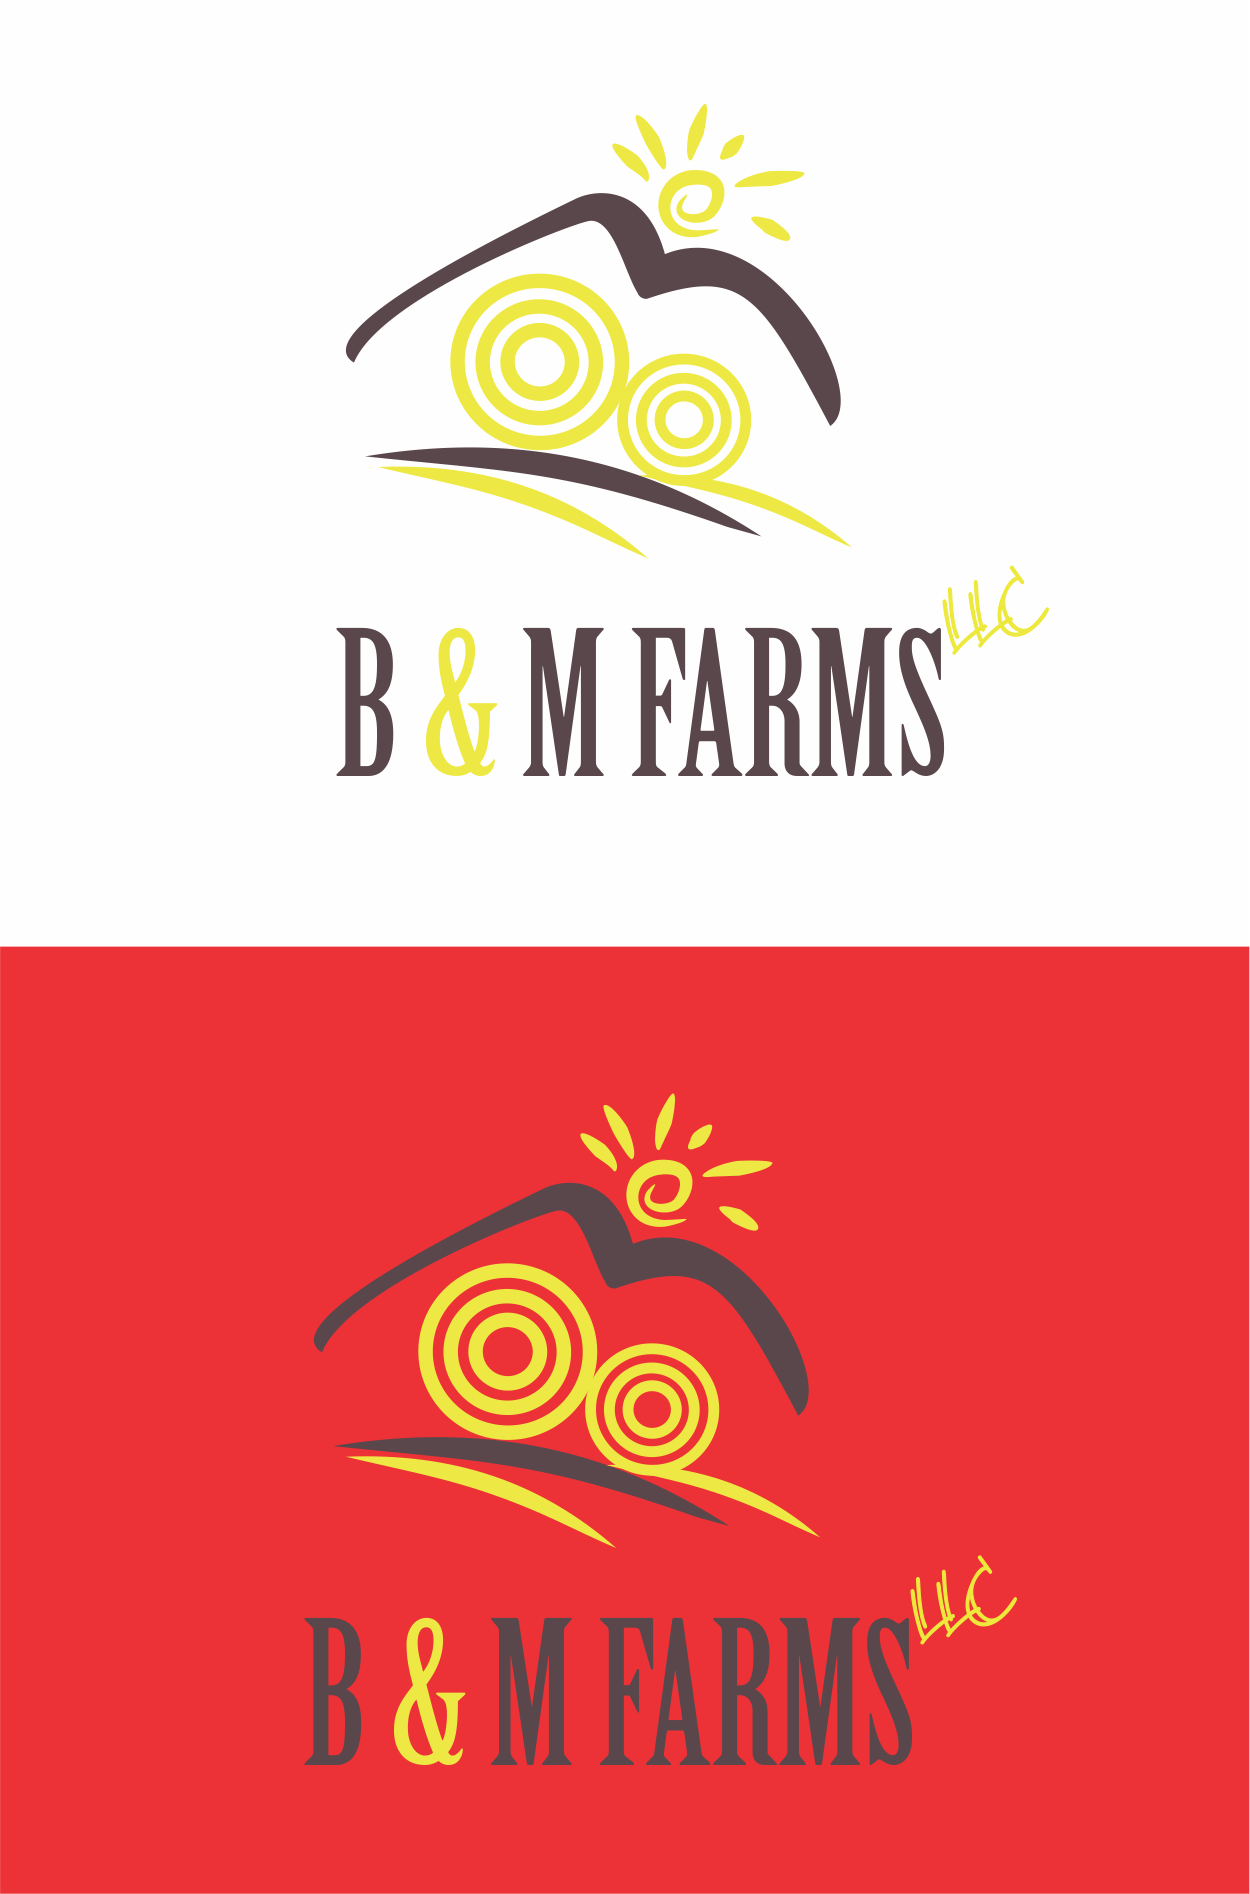 Logo Design by NEHA CHAVAN - Entry No. 31 in the Logo Design Contest Creative Logo Design for B & M Farms, LLC.